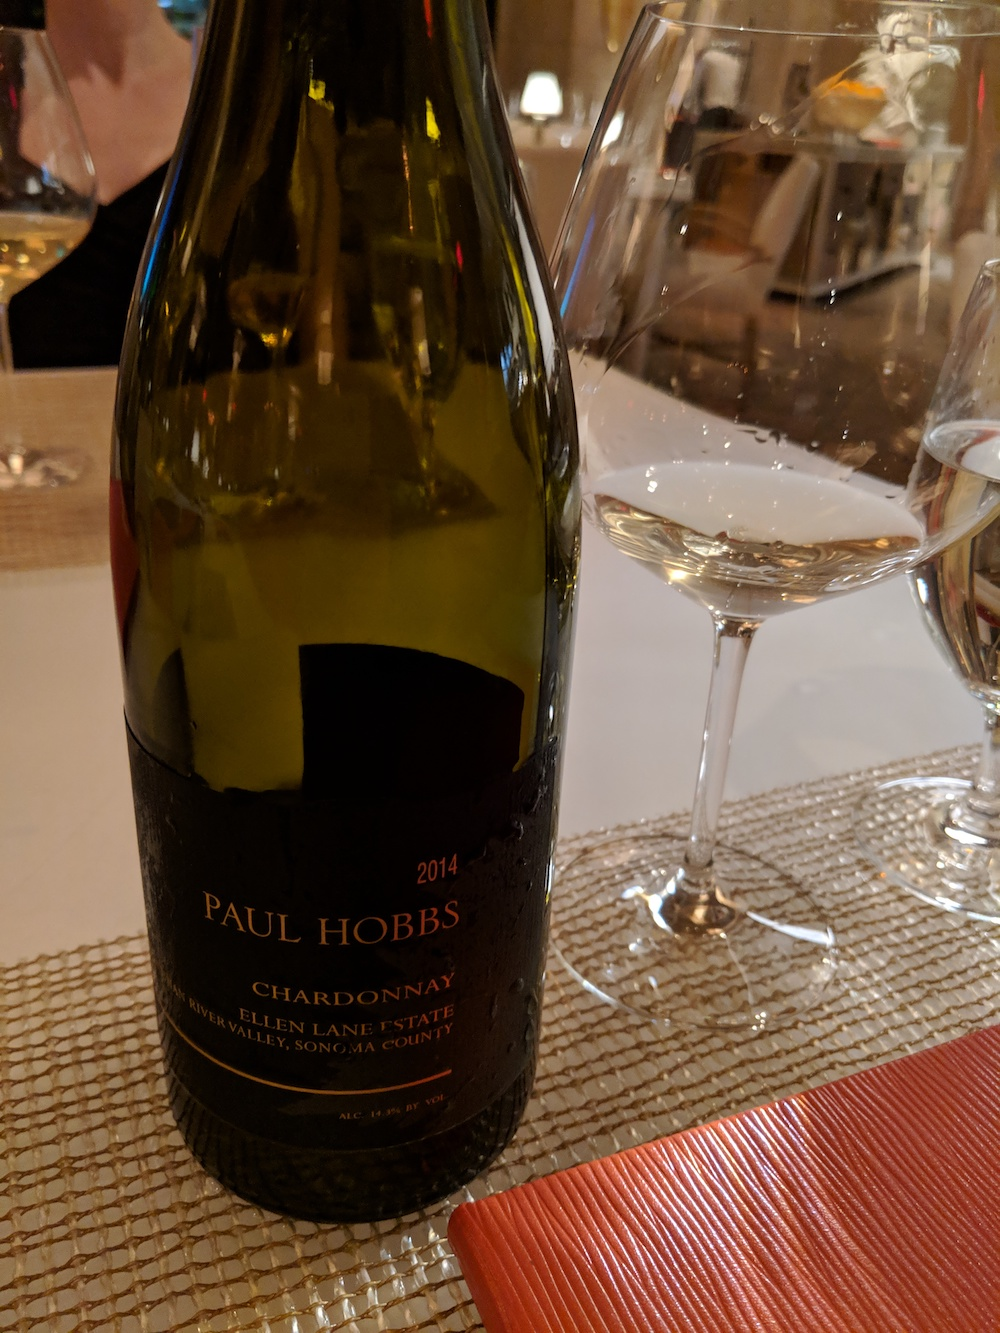 2014 Paul Hobbs Chardonnay